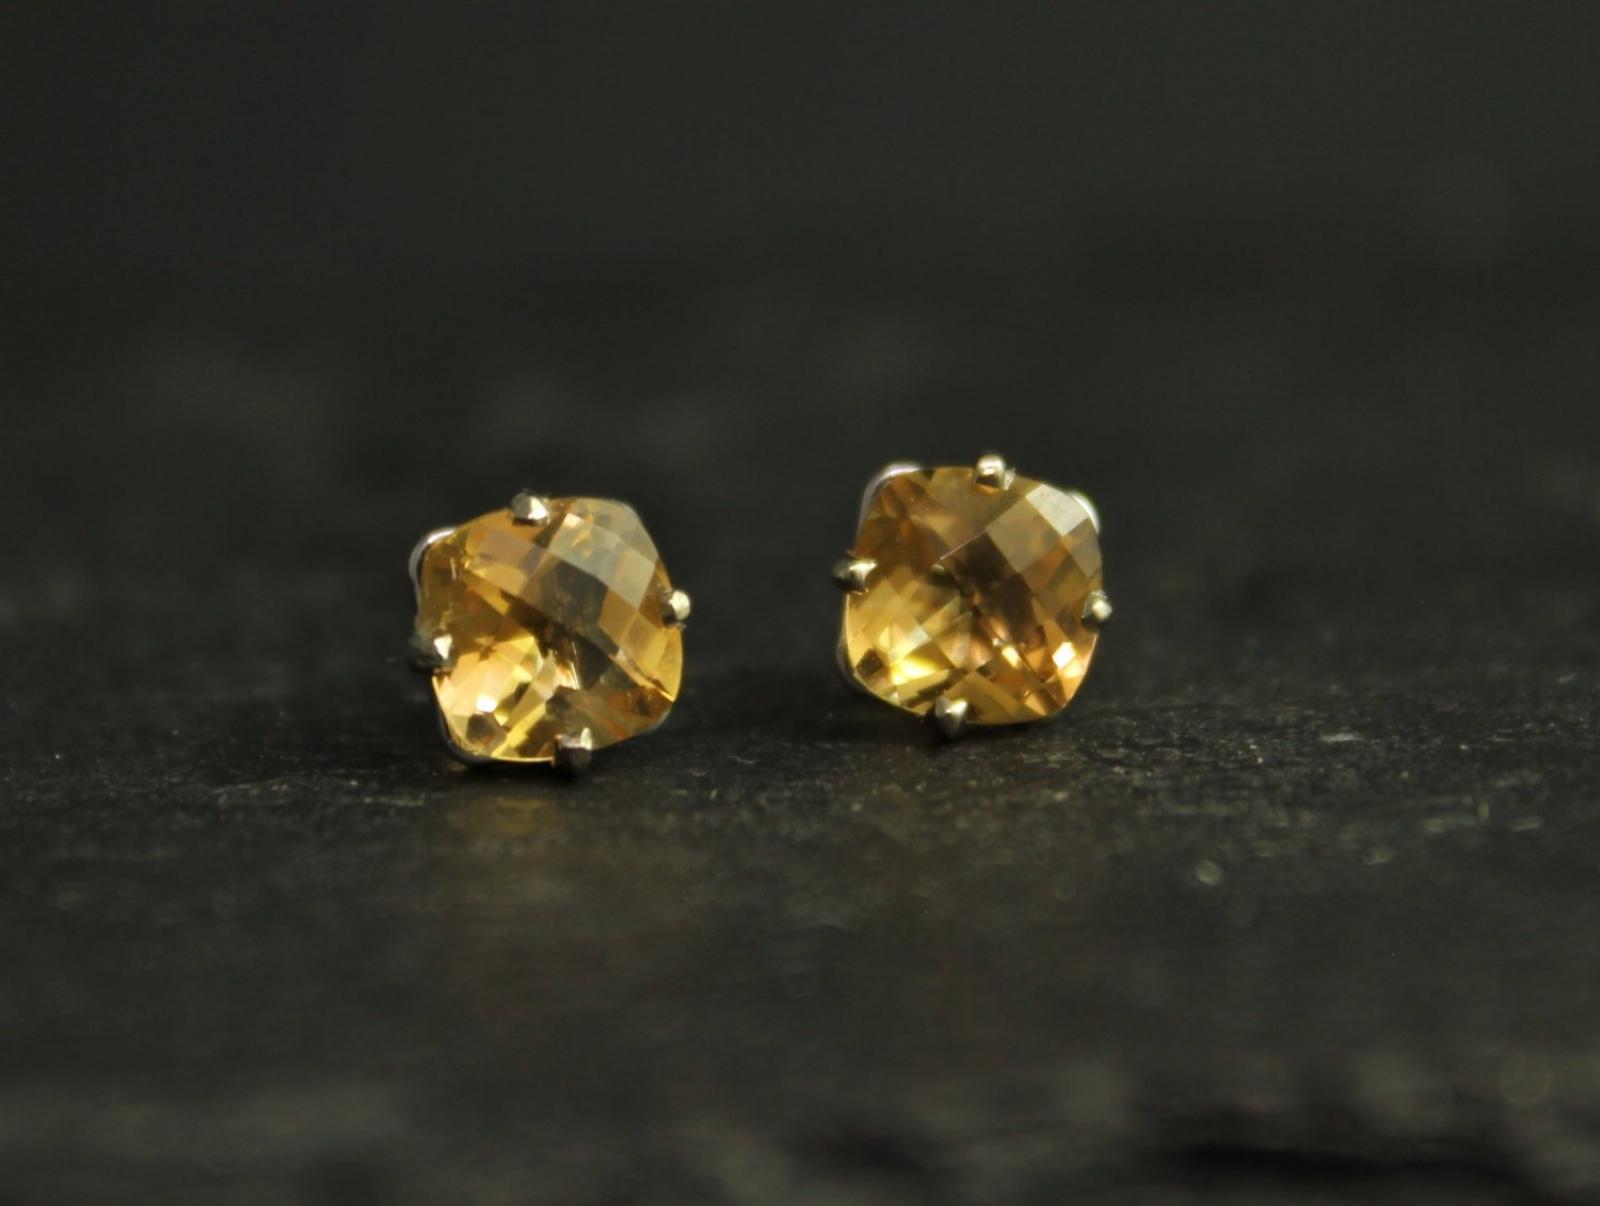 Citrine 14k White Gold Stud Earrings 6mm Cushion Cut November Birthstone Ready To Ship